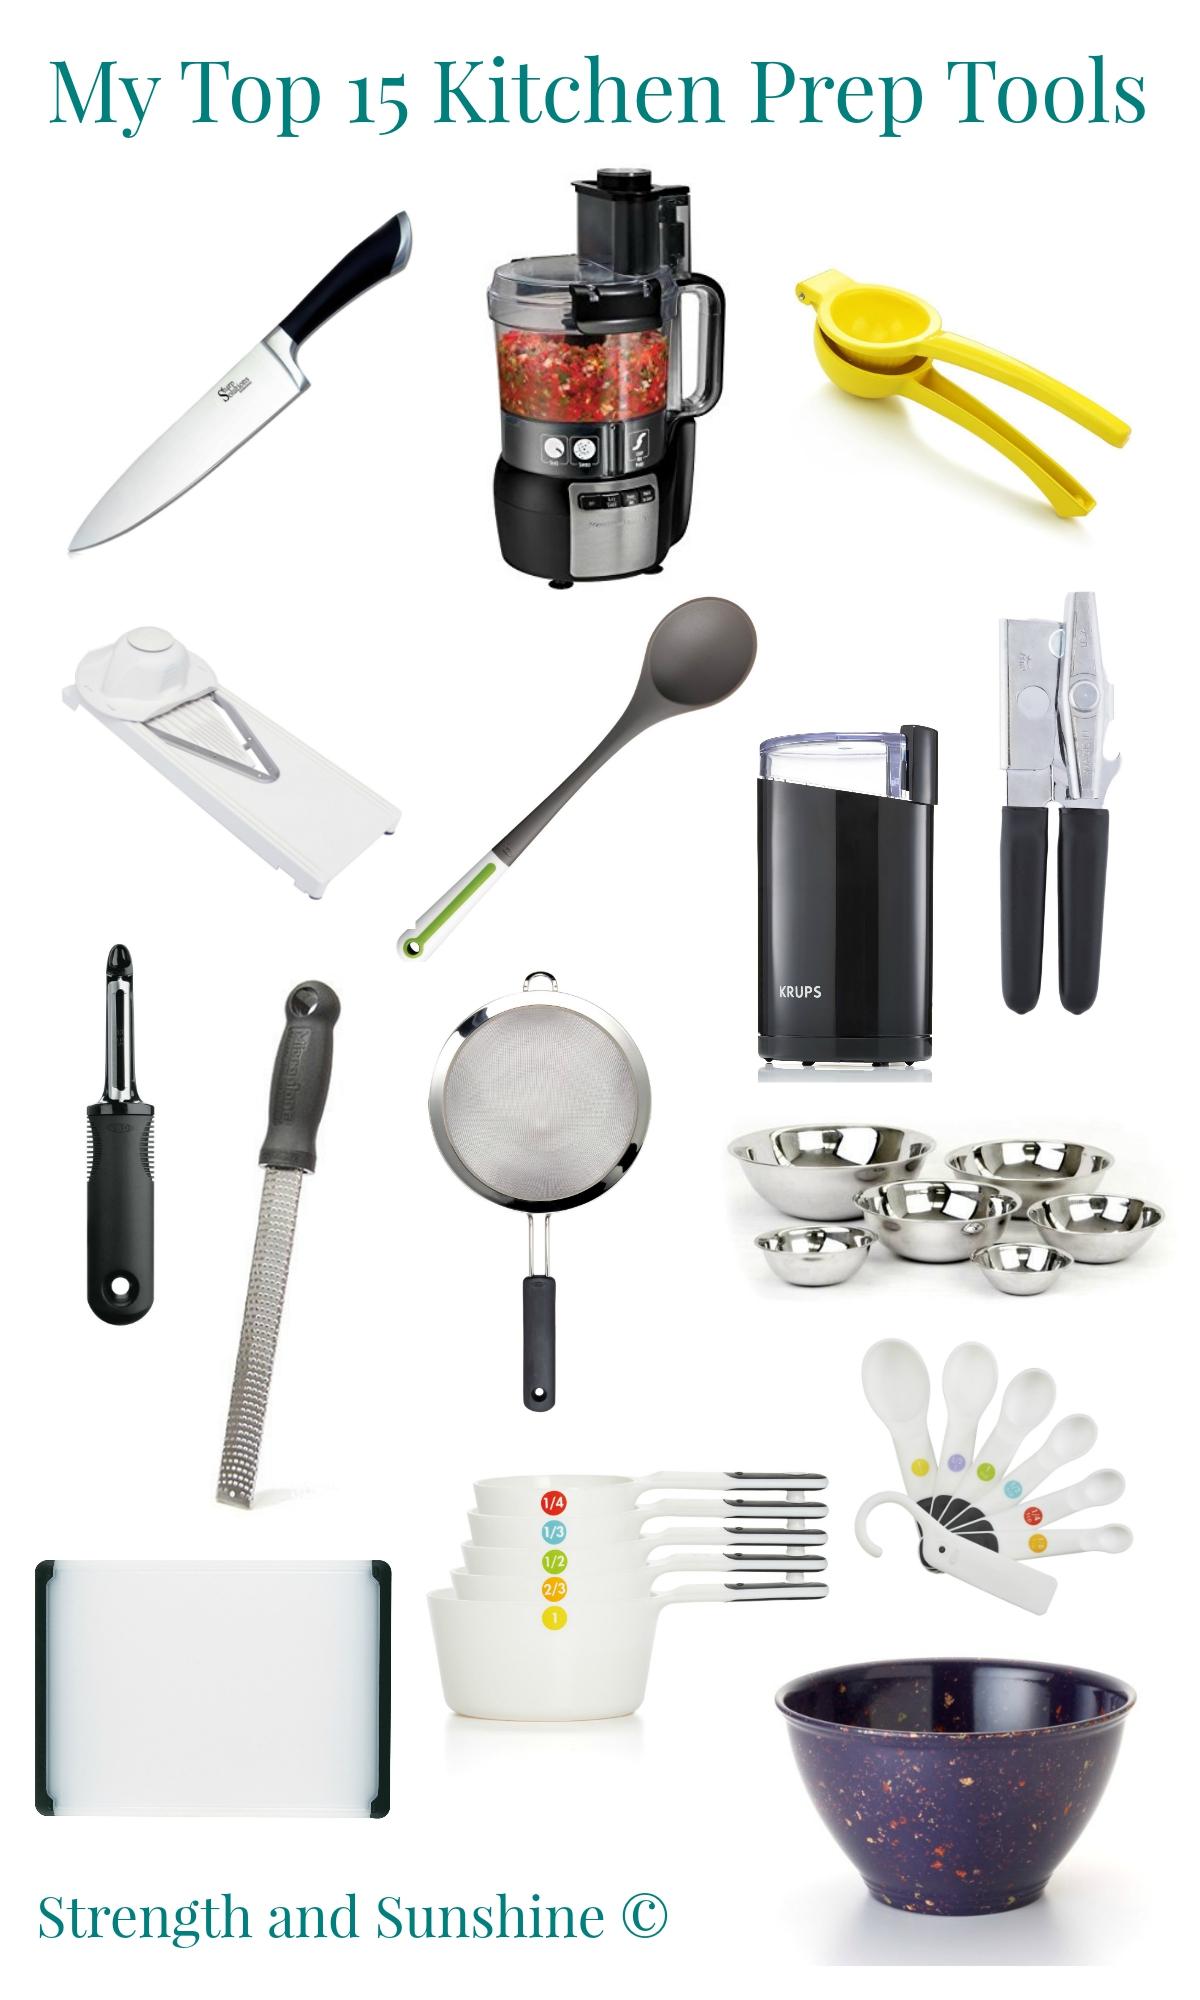 My Top 15 Kitchen Prep Tools